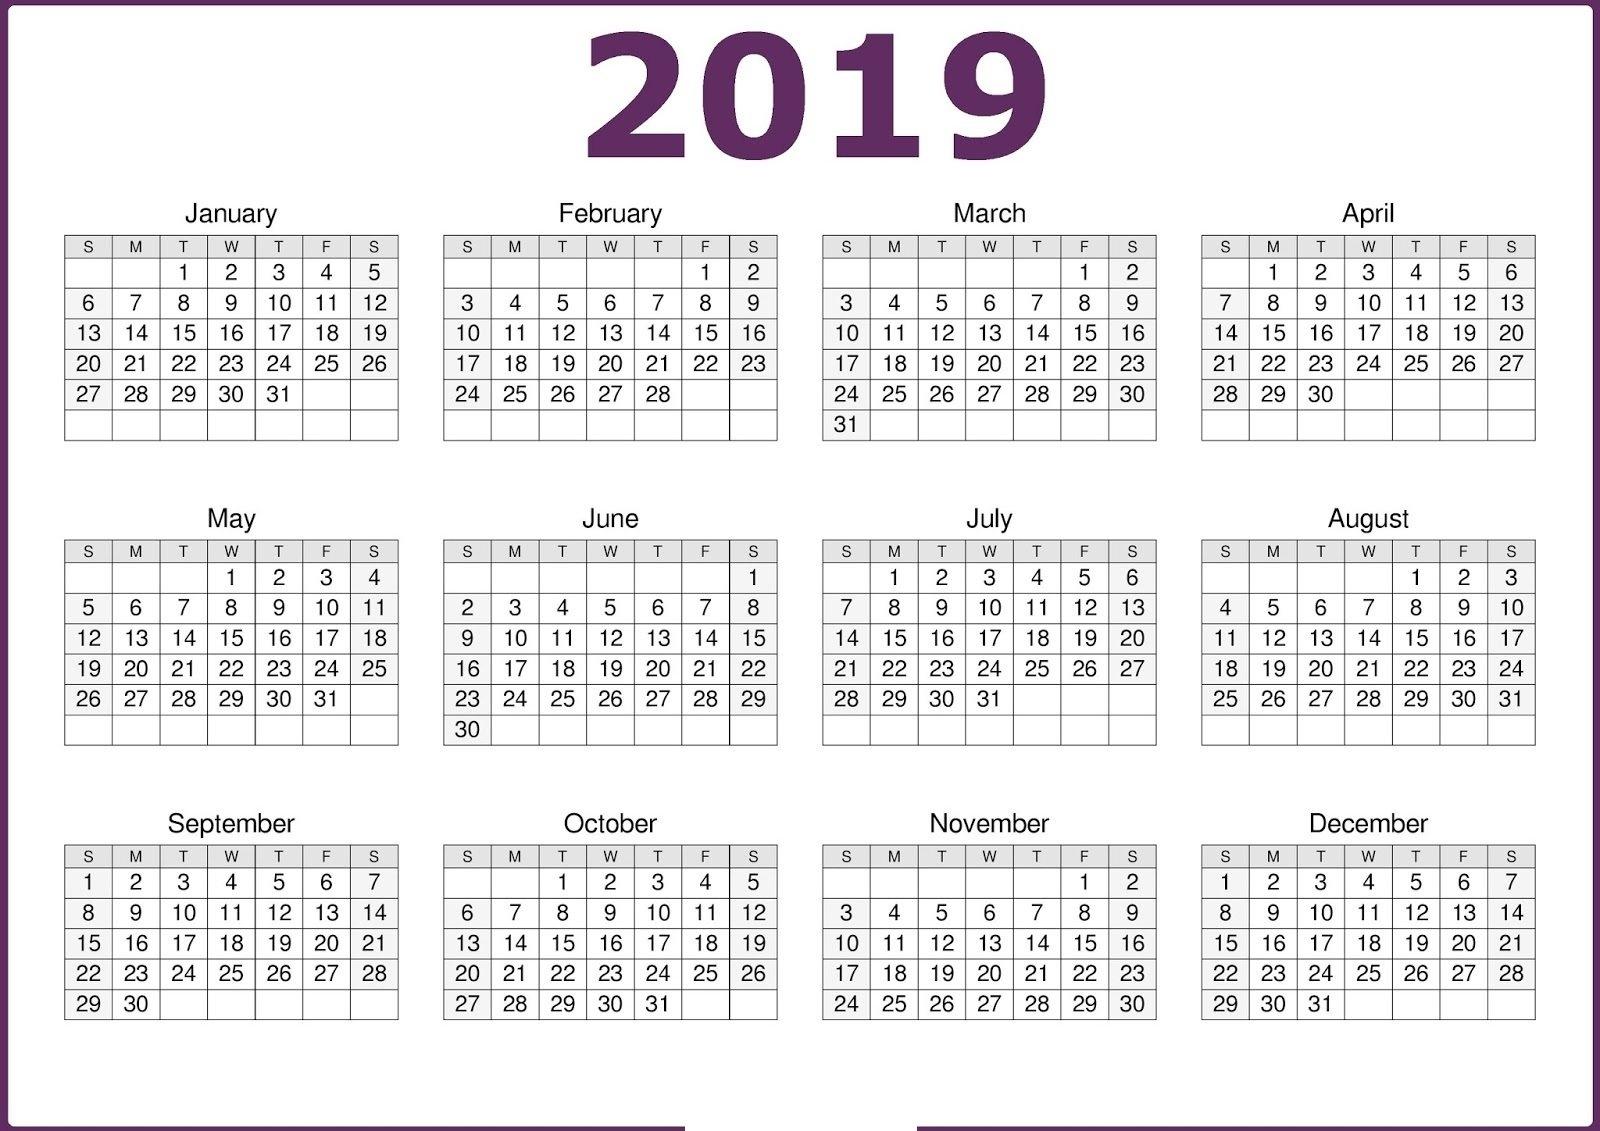 Get Free Blank Calendar Pages 2019 Templates | August 2018 Calendar 2019 Calendar Qld Printable